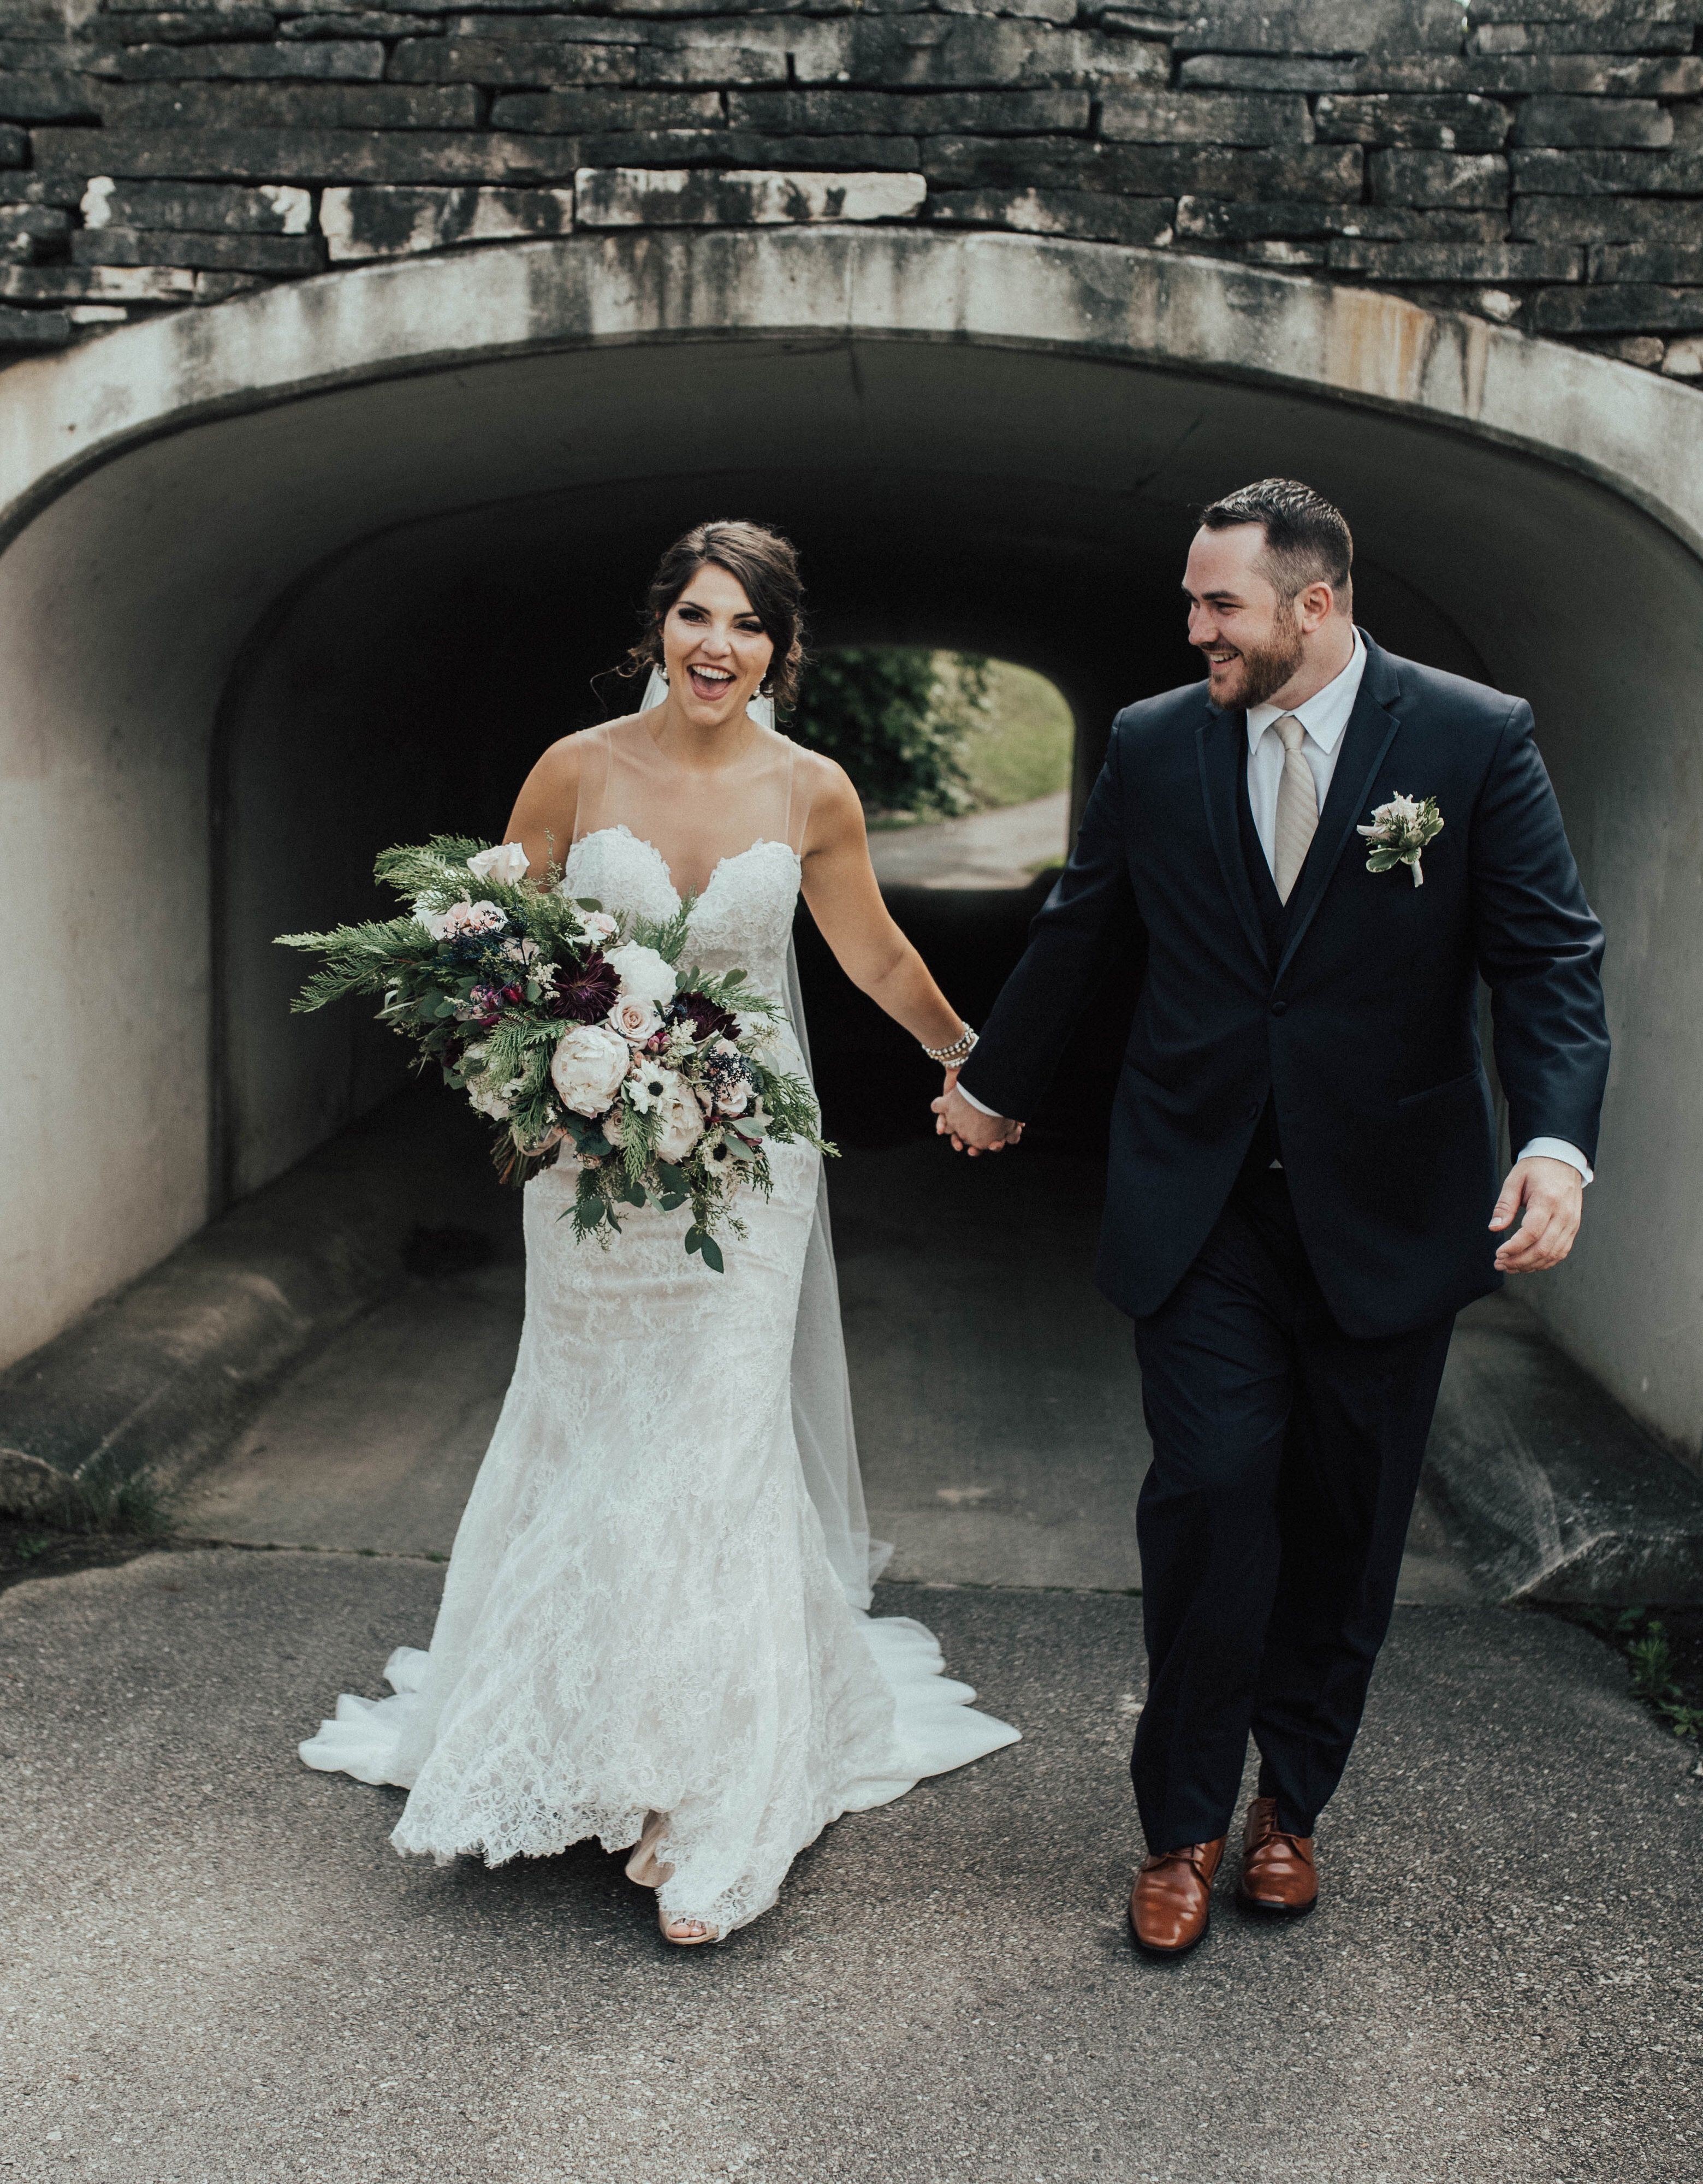 Bridal Party Neutral Bridesmaid Dresses Ohio Wedding Wedding Photography